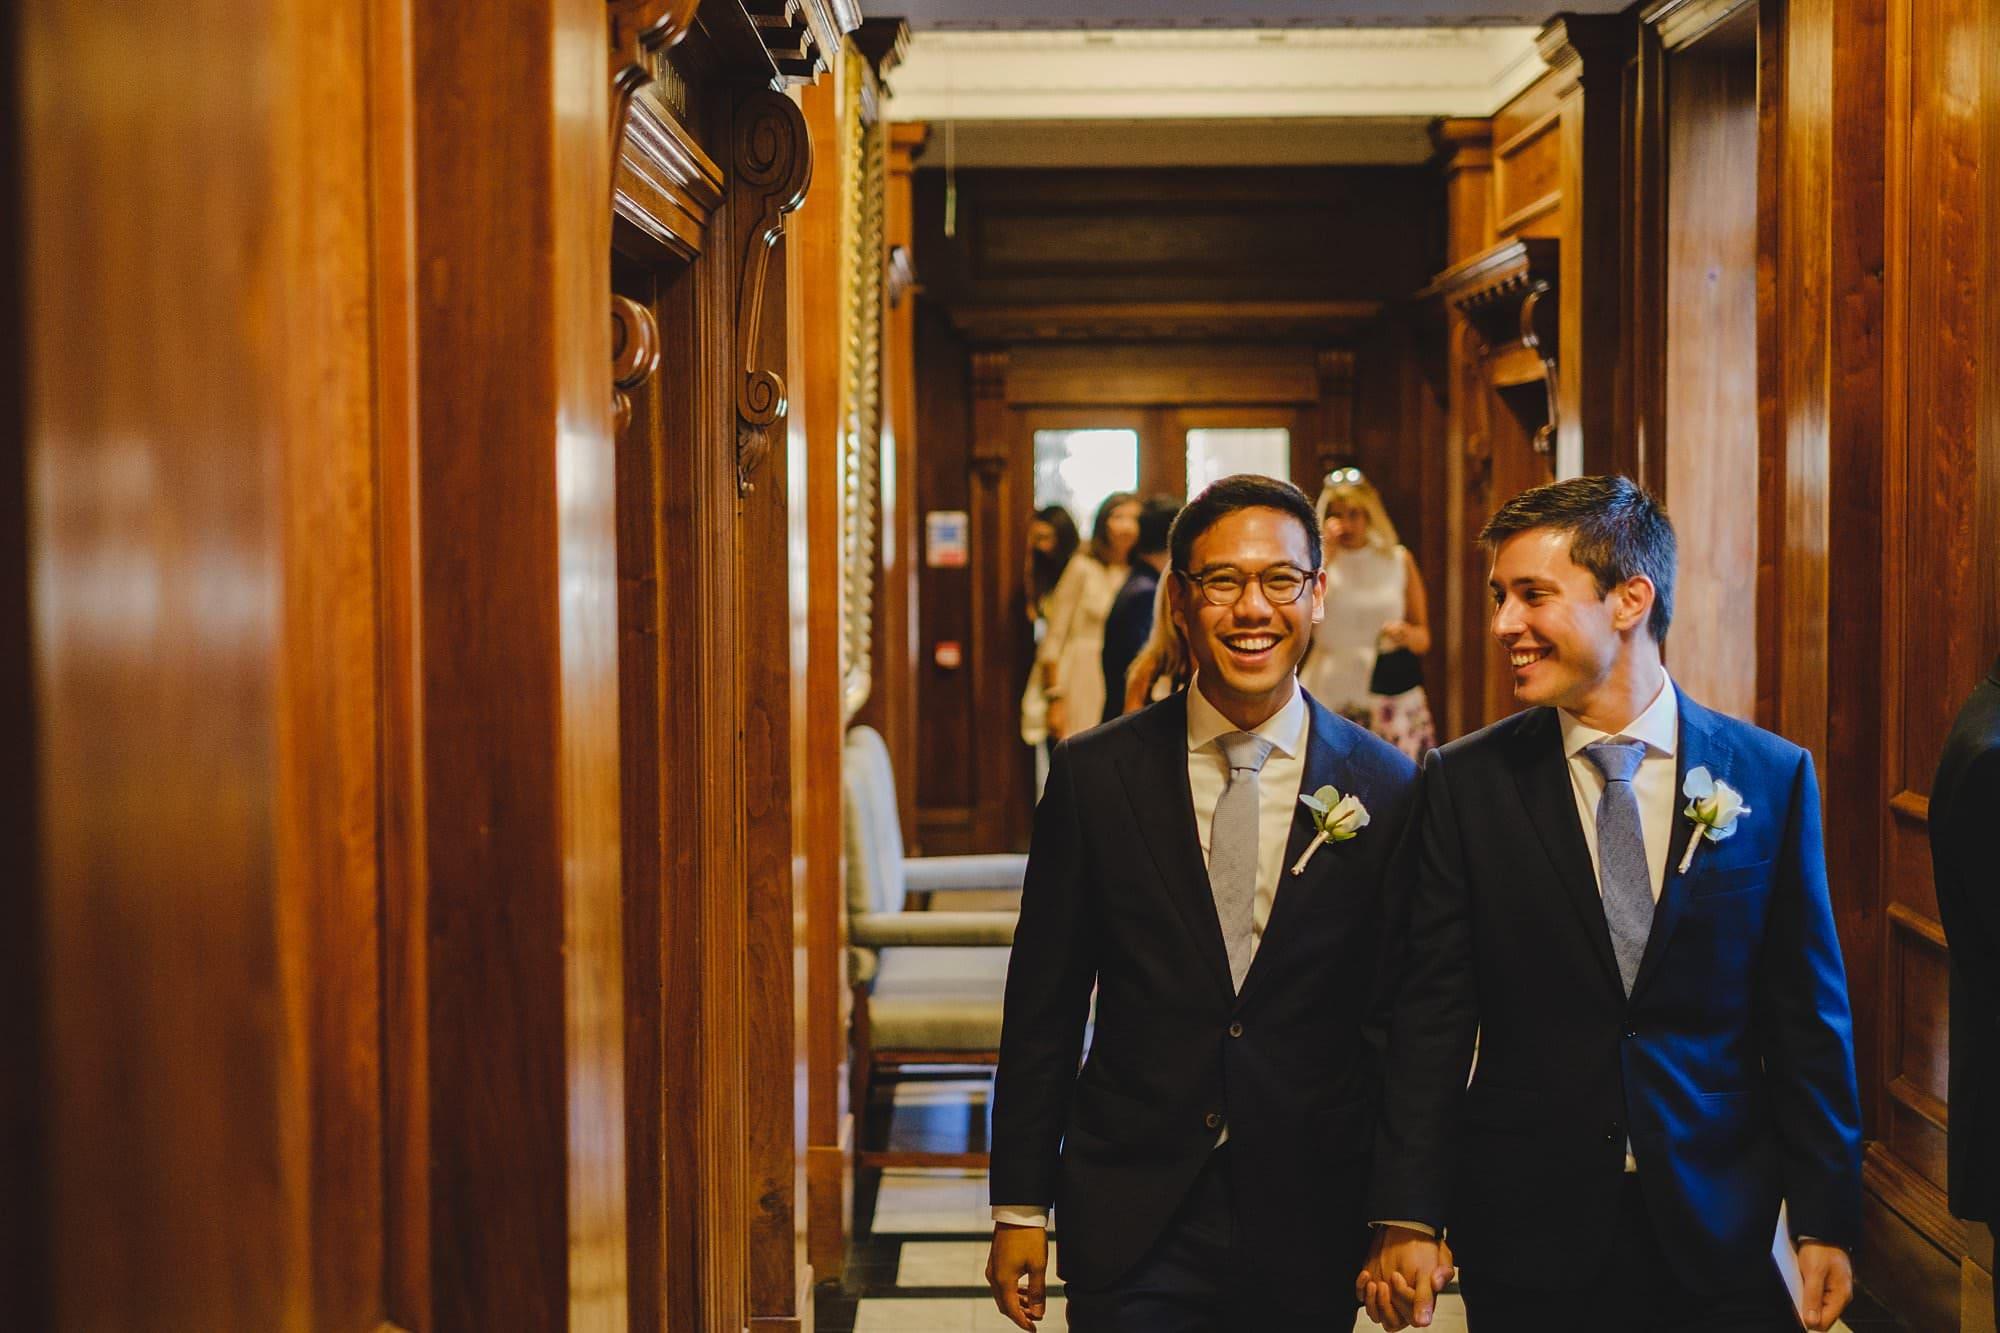 old marylebone town hall wedding photographer wedding jh 024 - Hugo + Josh   Marylebone